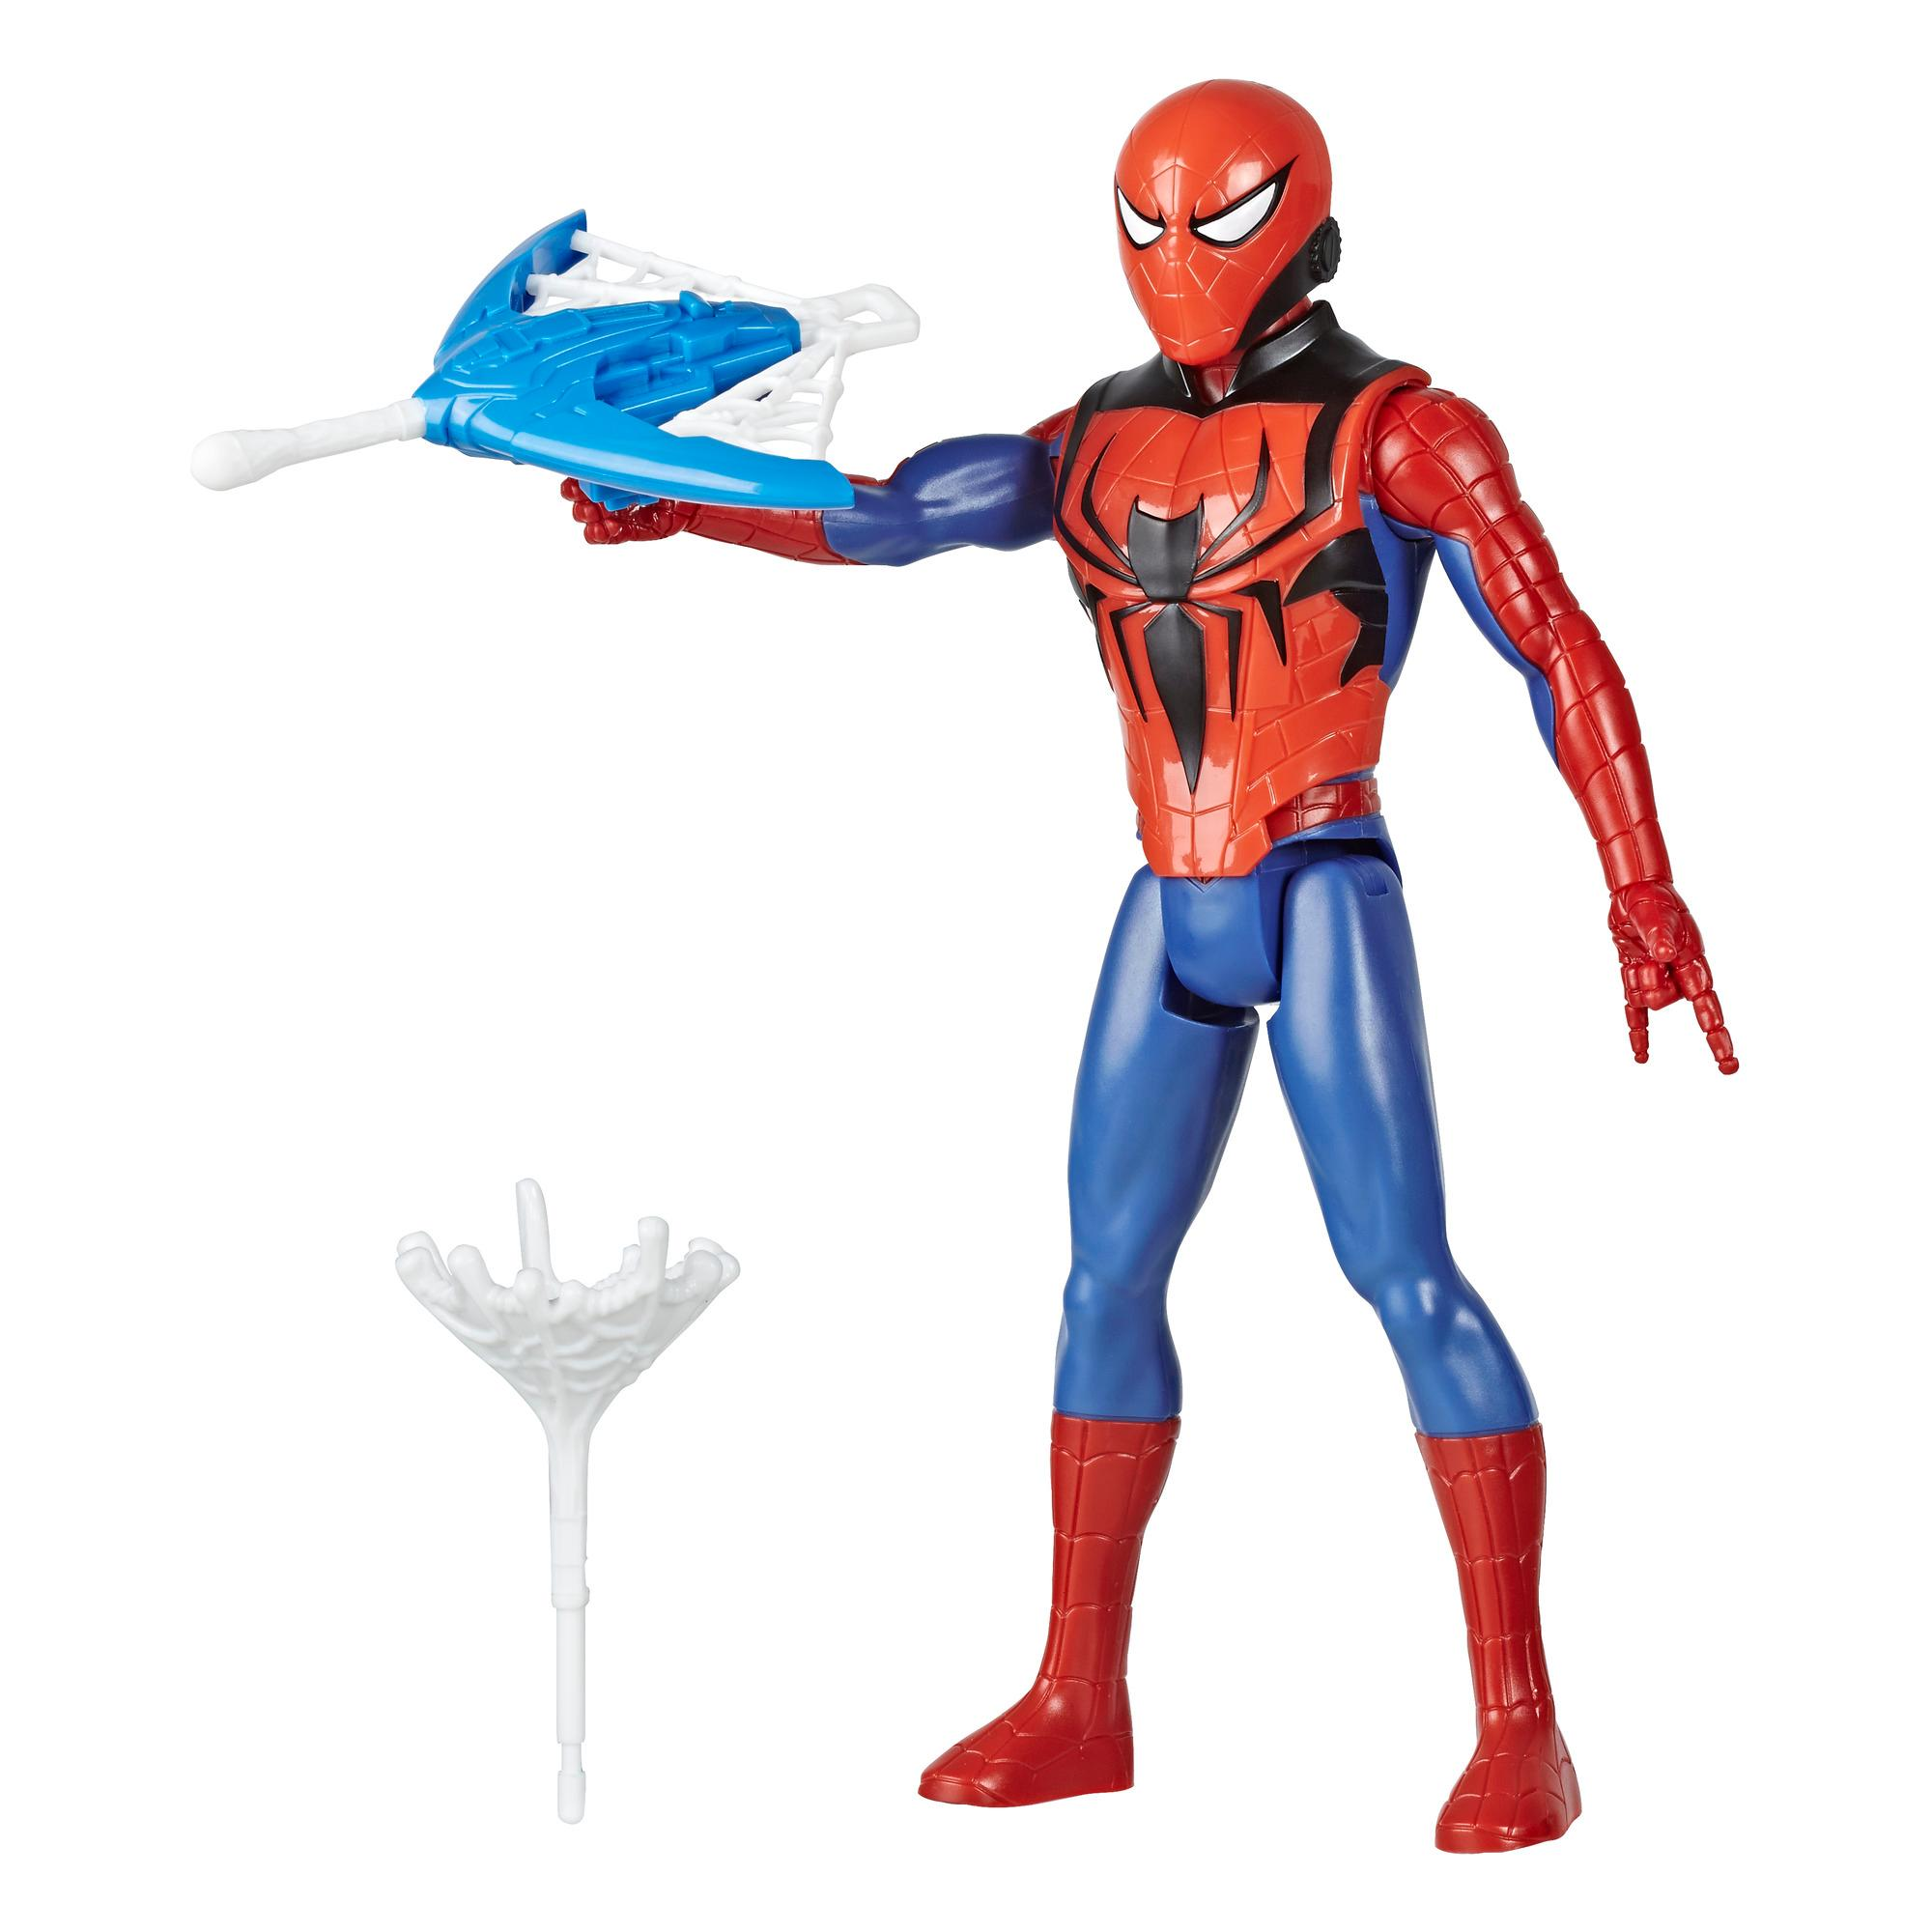 SPIDER-MAN FIGURA TITAN CON ACCESORIOS